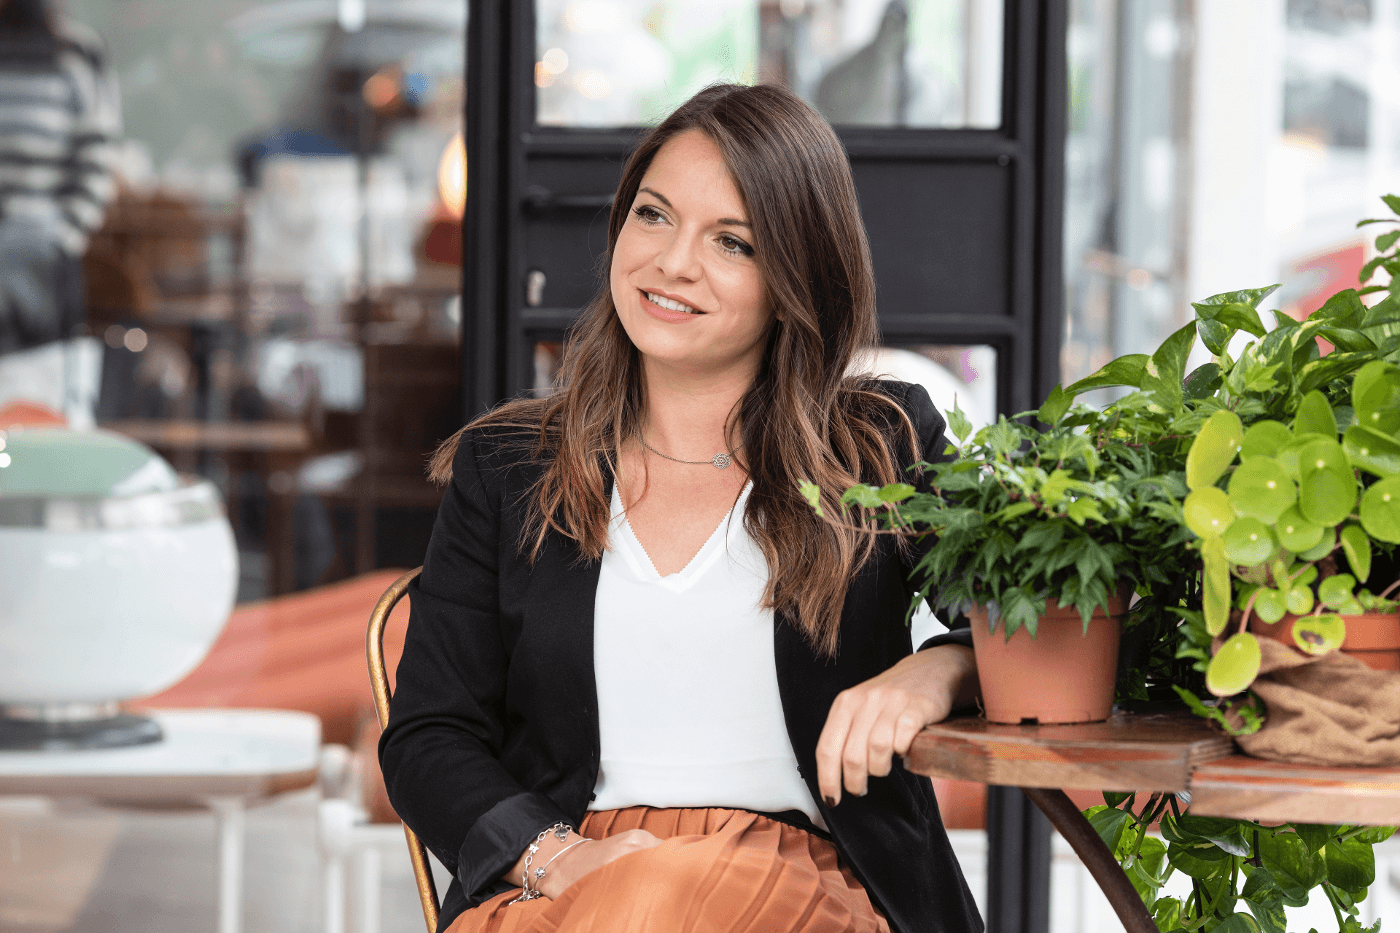 Susanna Fanfarillo